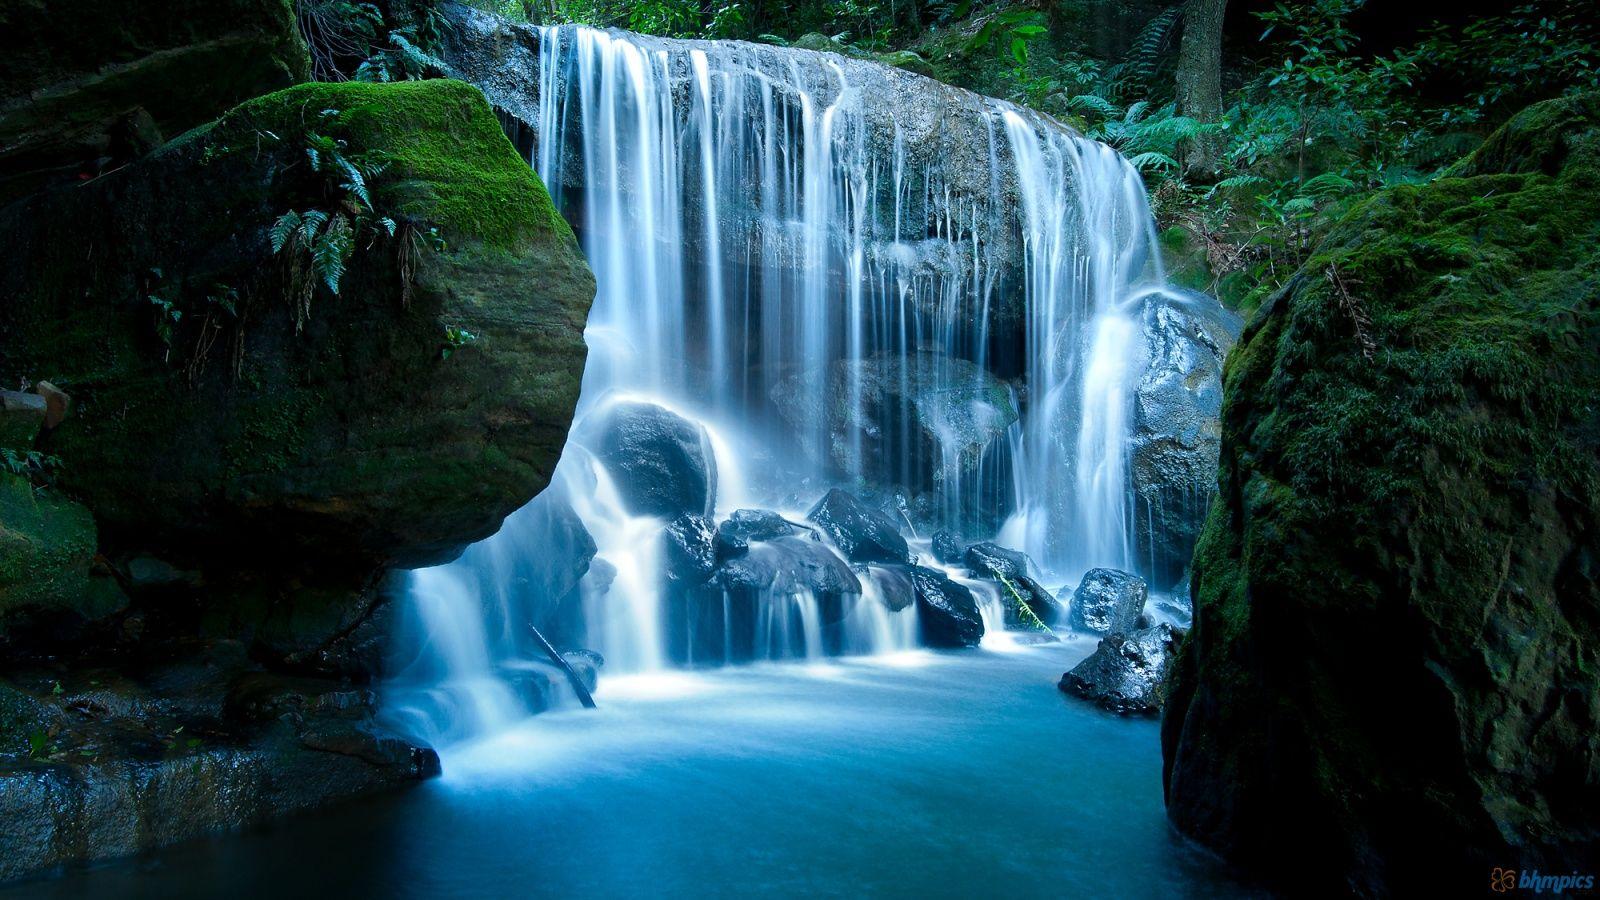 Blue mountains waterfall nsw australia hd wide wallpaper blue mountains waterfall nsw australia hd wide wallpaper altavistaventures Gallery